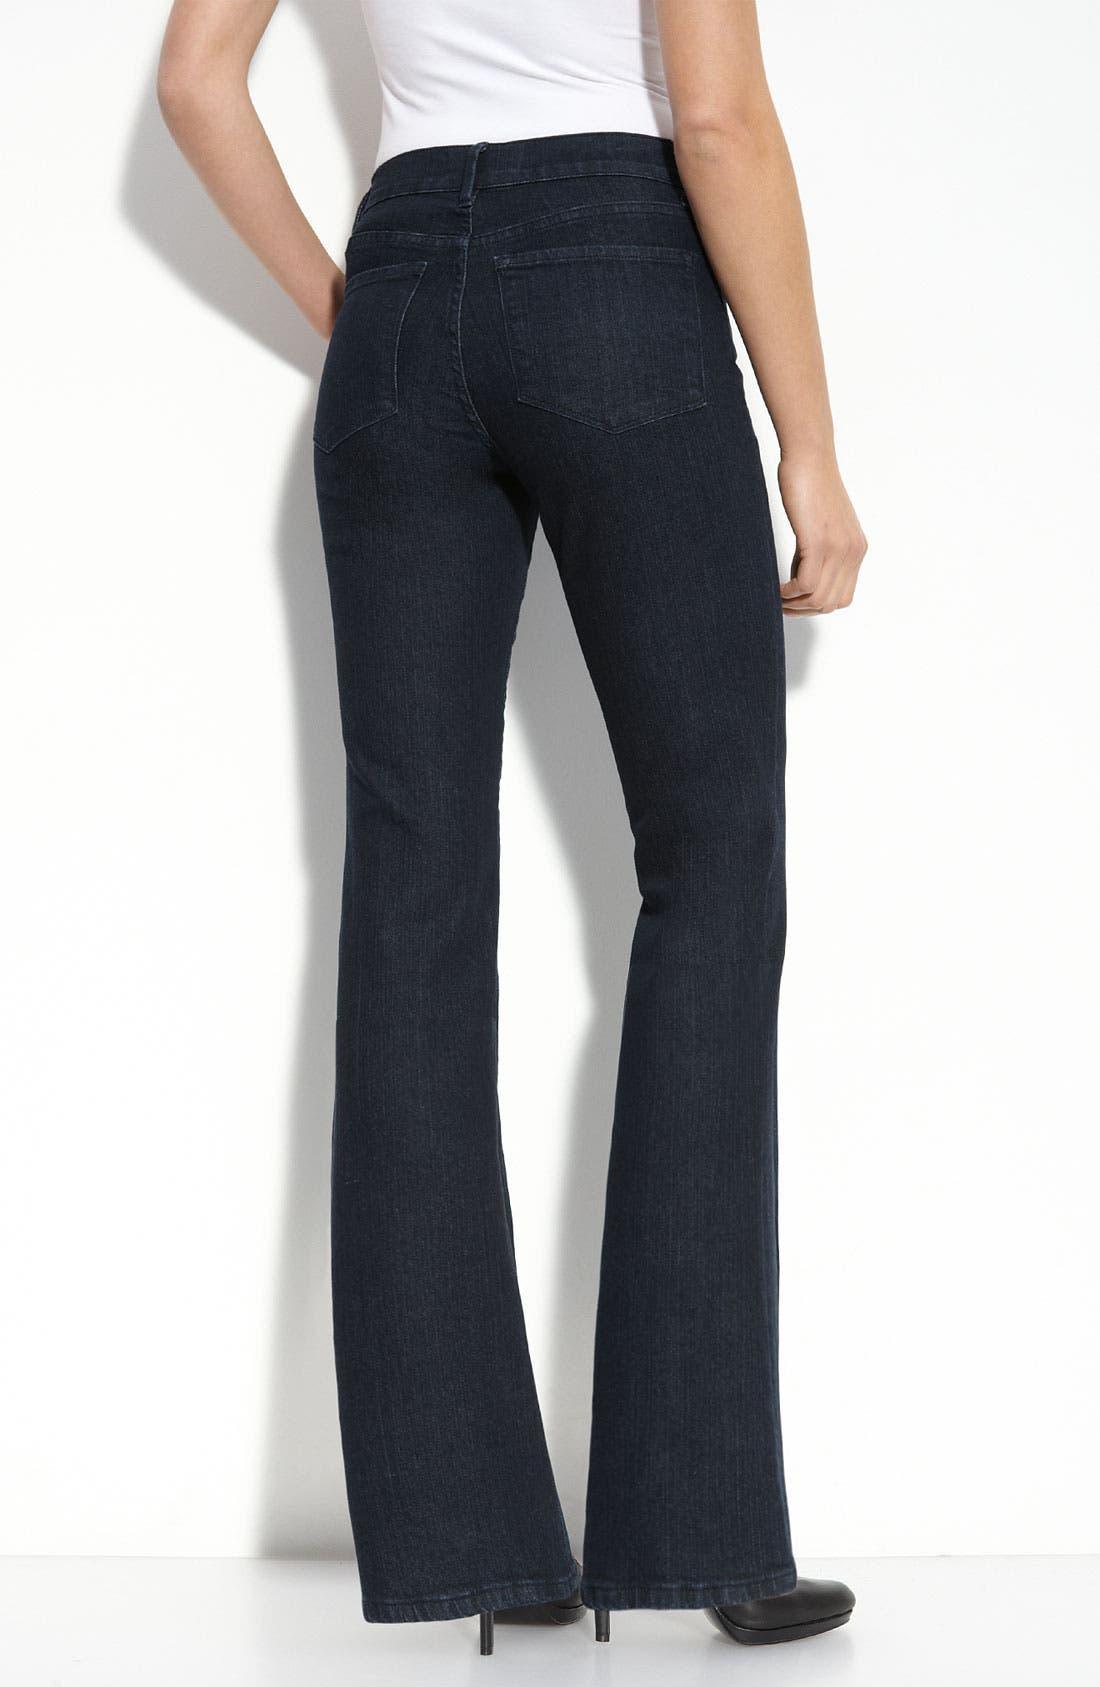 Alternate Image 1 Selected - NYDJ Flare Leg Stretch Jeans